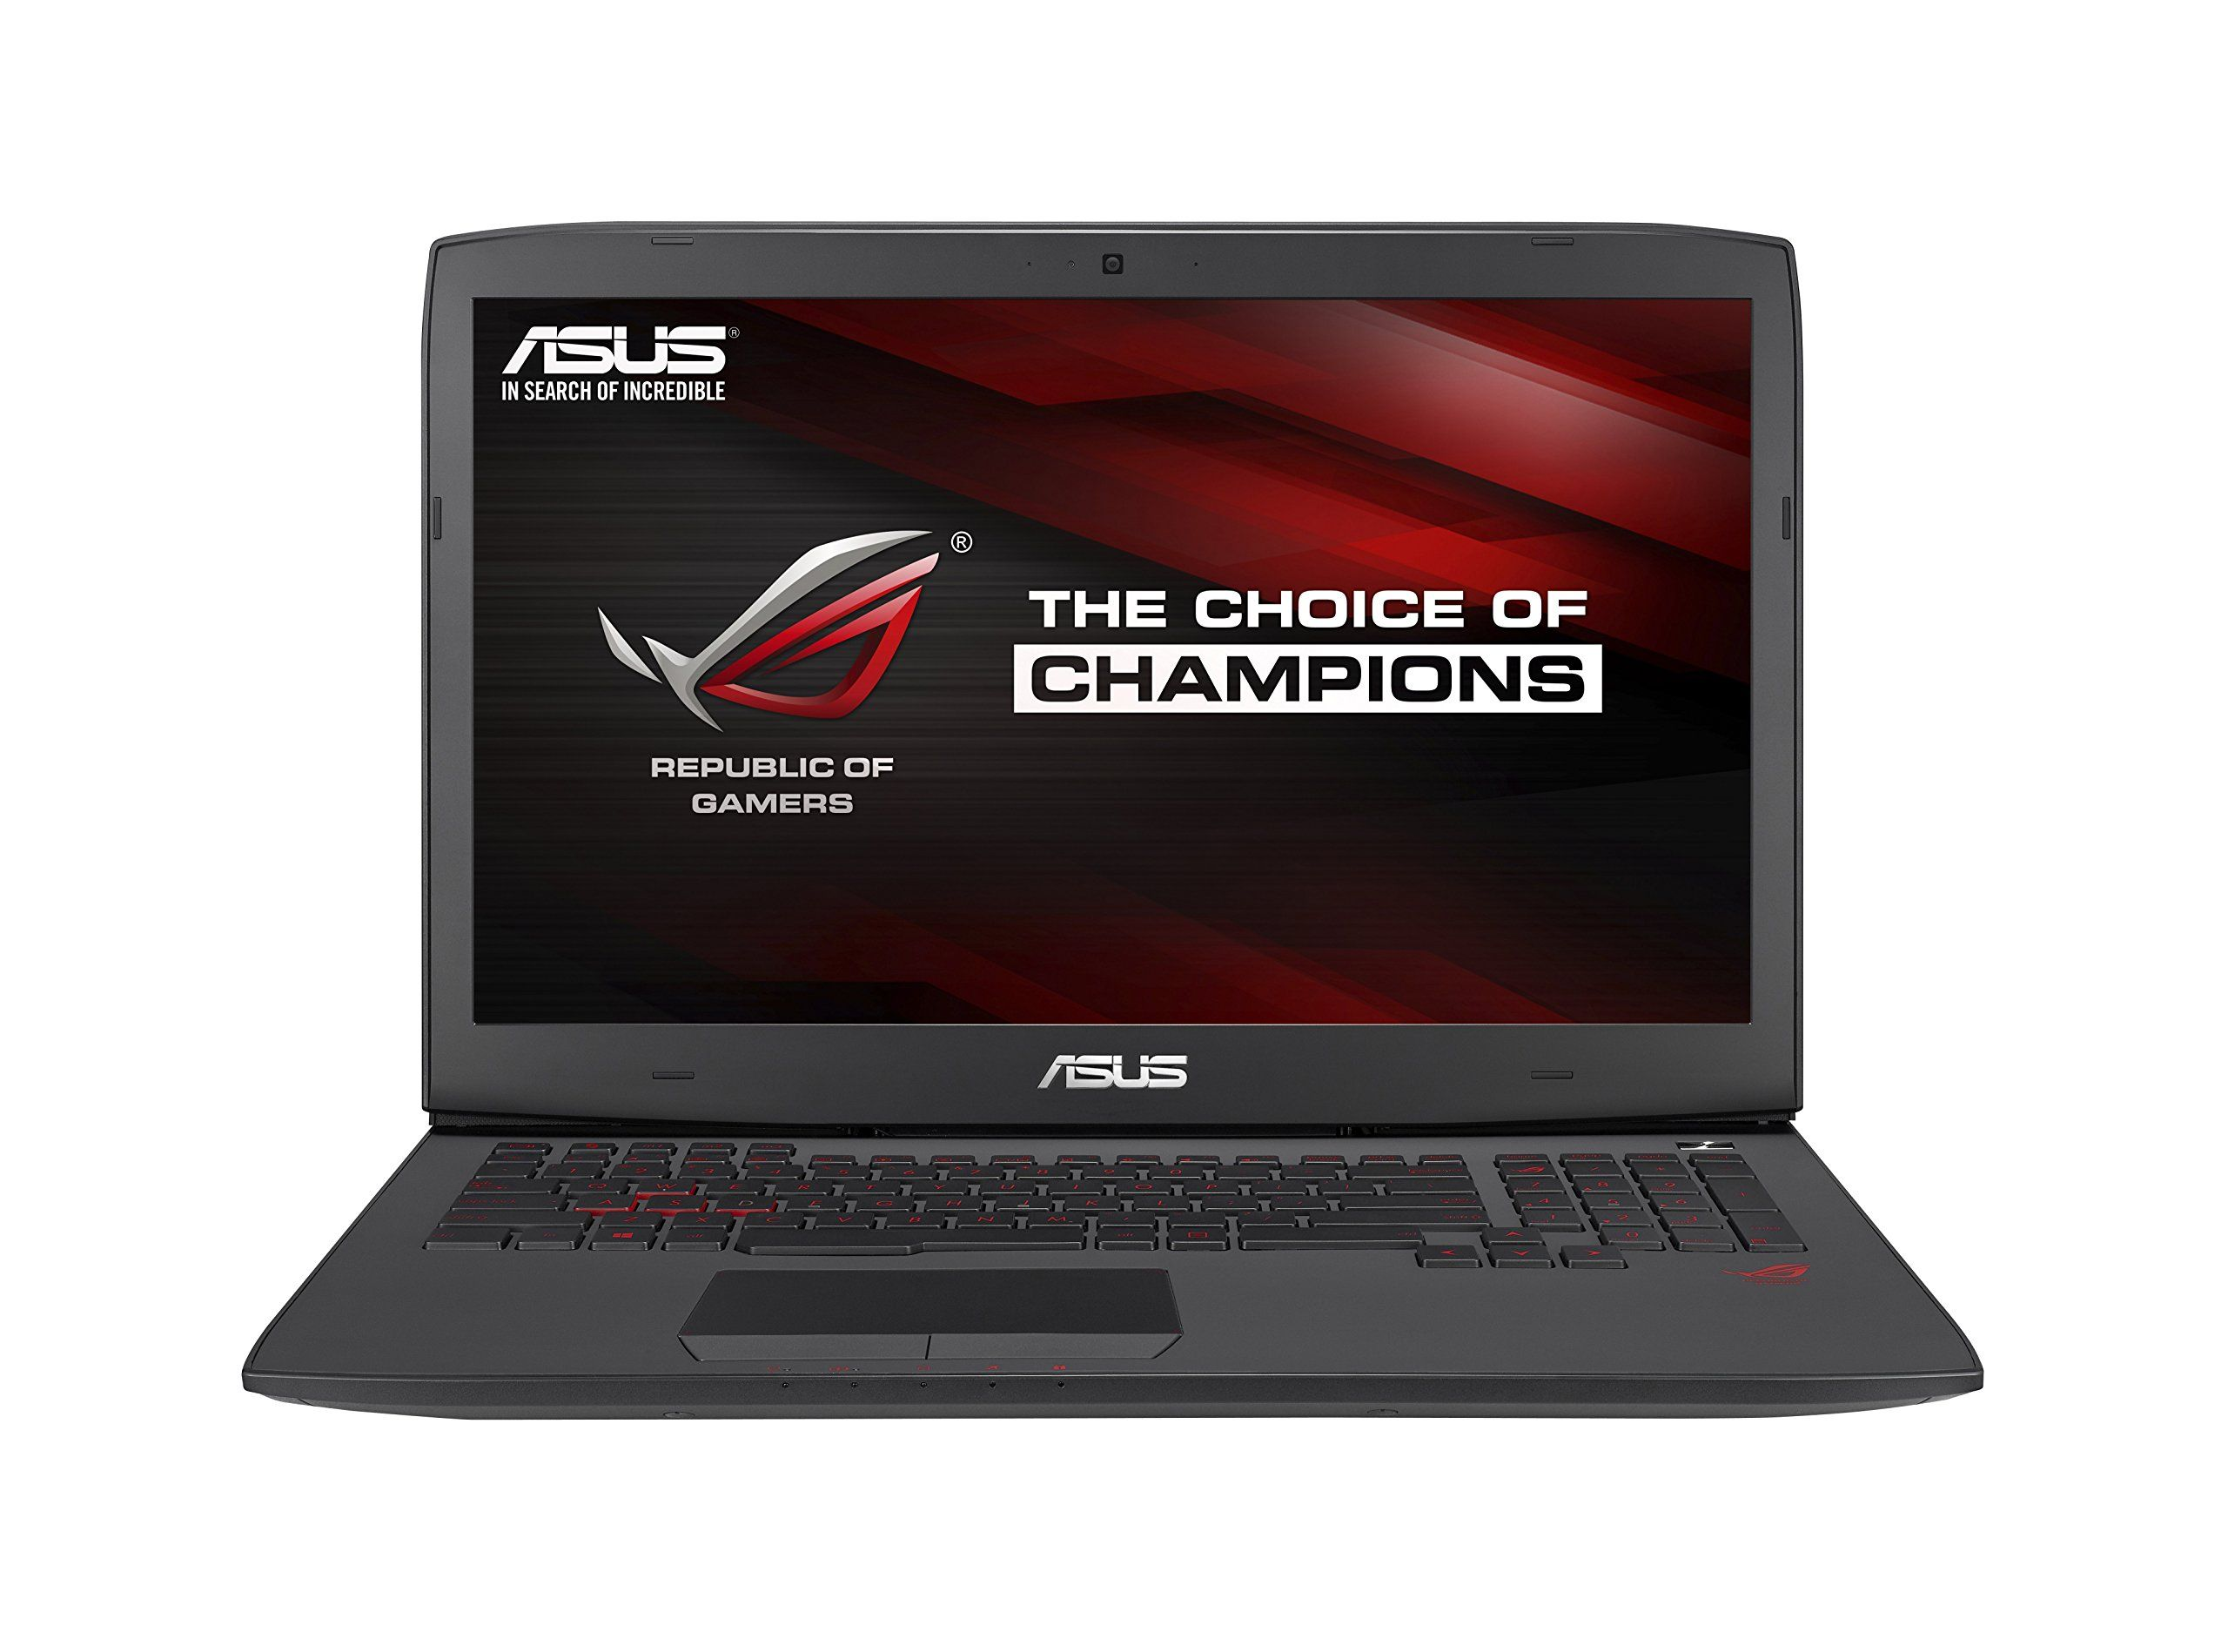 "ASUS G751JY 17-Inch Gaming Laptop [2014 model]. Intel Core i7-4720HQ 2.6GHz (turbo up to 3.6 GHz). 16 GB RAM. 1 TB 7200RPM Hard Drive. Plus 128GB SSD. NVIDIA GeForce GTX 980M with 4GB DDR5 VRAM (G-Sync). 17.3"" IPS 16:9 FHD matte display (1920x1080) with built in G-Sync hardware. Gigabit dual-band 802.11AC ultra-fast Wi-Fi. 10/100/10000 Gigabit Ethernet. 4x USB 3.0, 1x Thunderbolt 2, 1x HDMI, 1x VGA/Mini D-sub 15-pin, 1x SPDIF, 1x Headphone-out, 1x Mic-in. Intelligent Thermal Design, rear..."